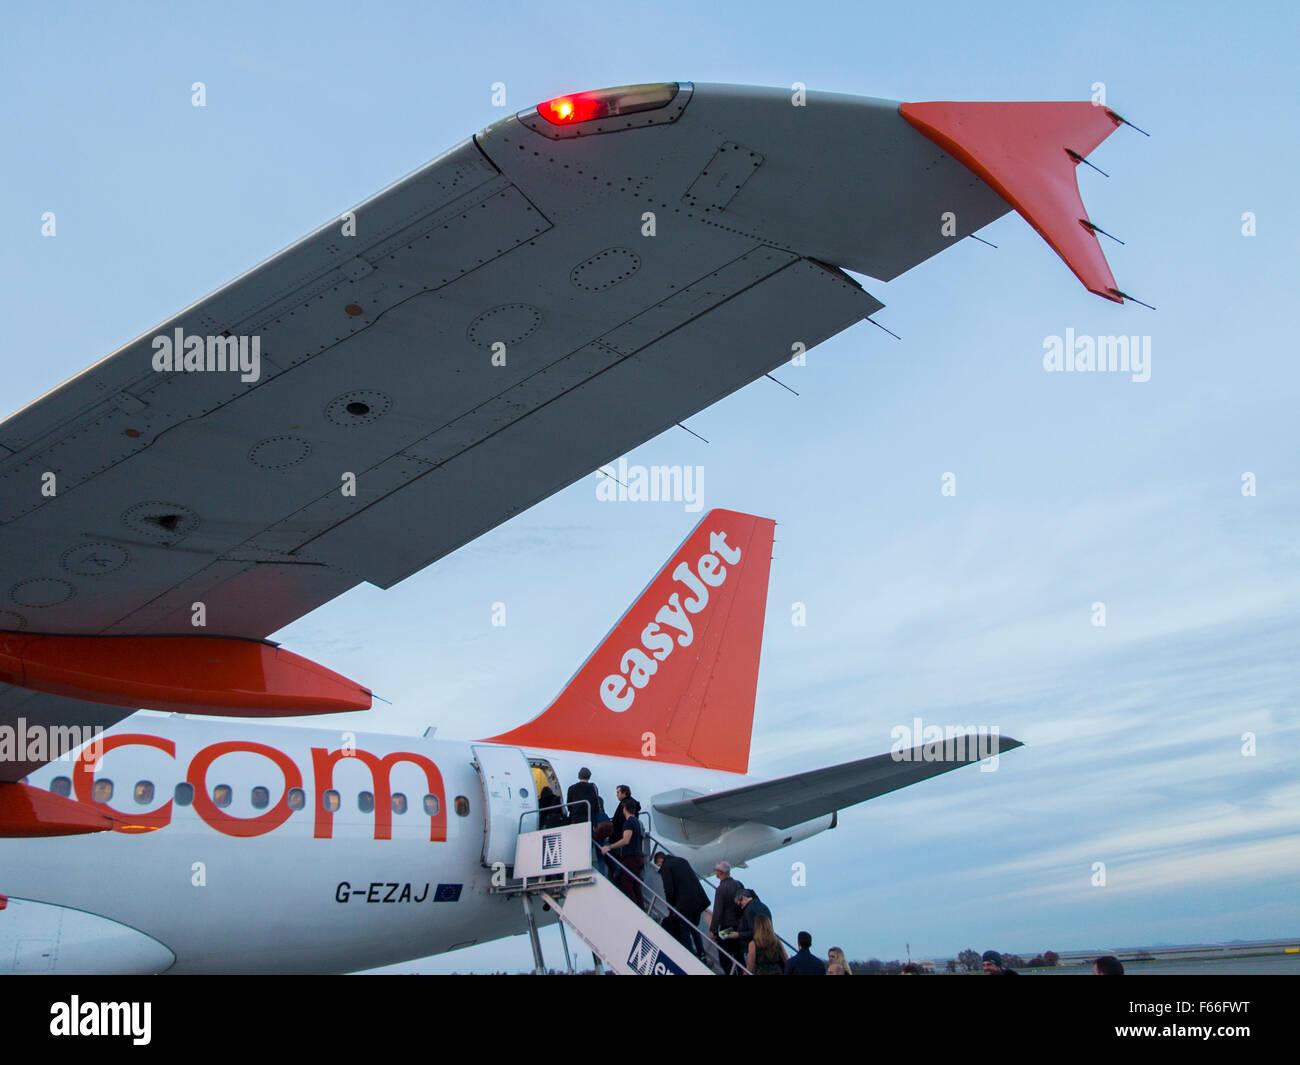 Easyjet plane at Prague airport - Stock Image